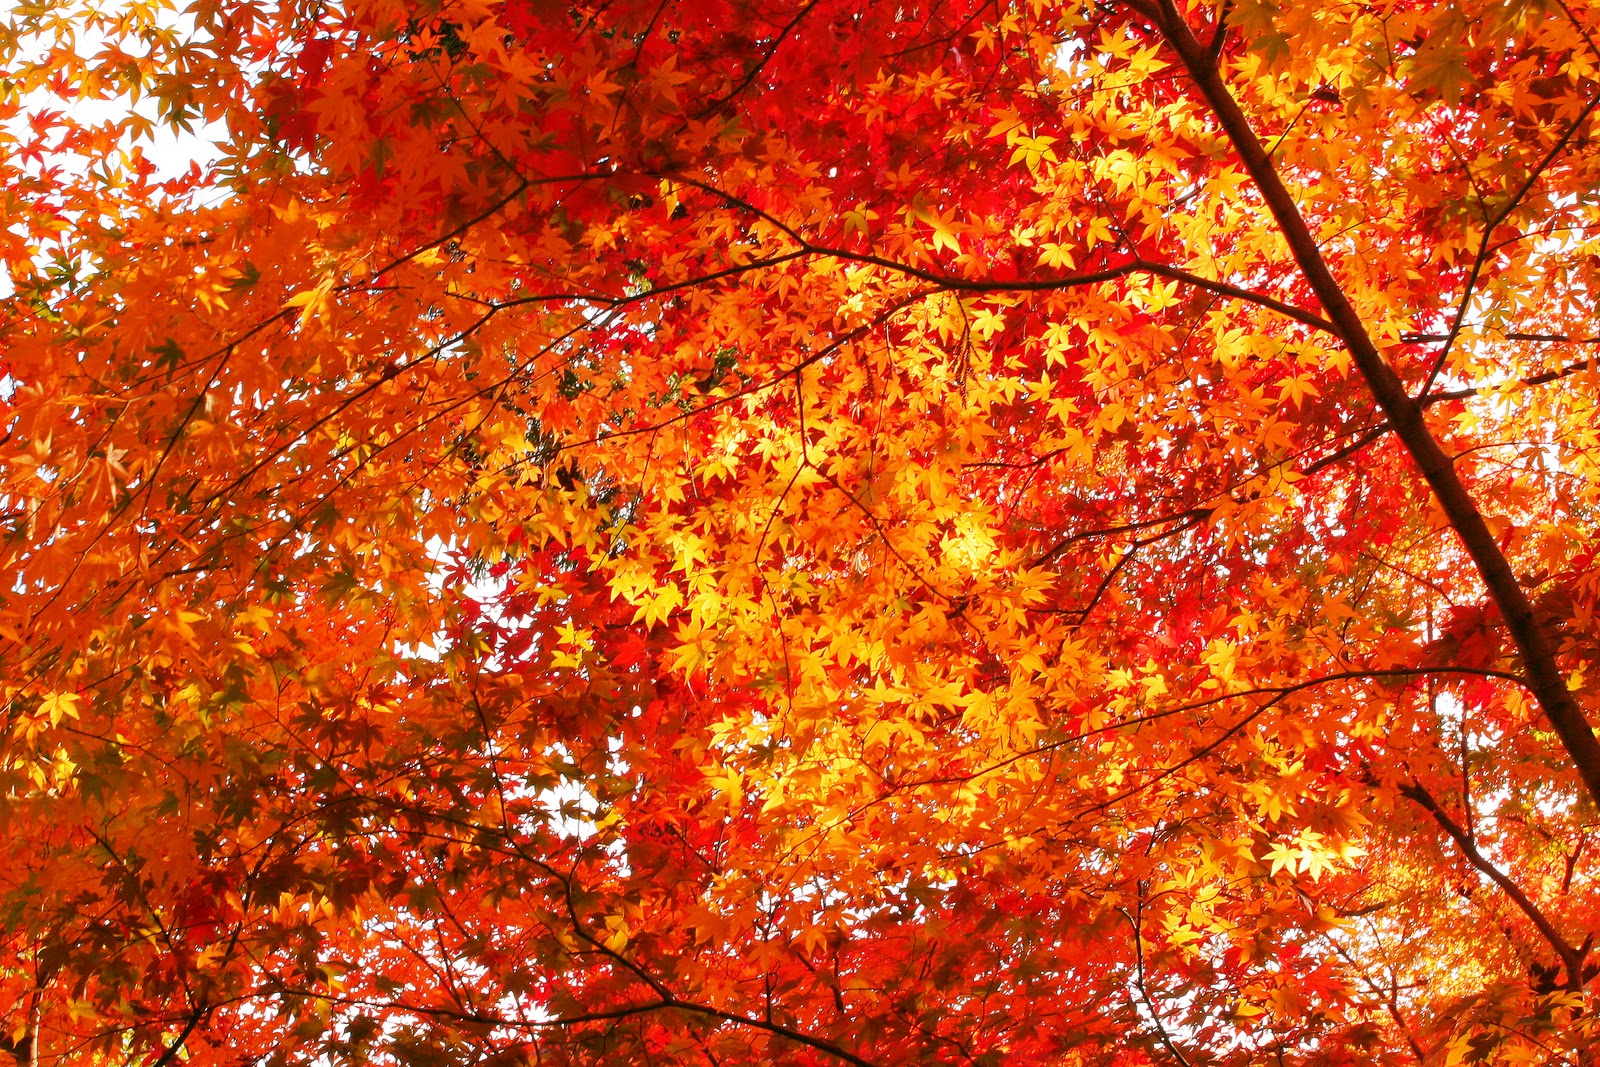 http://4.bp.blogspot.com/-mfQG7VetbU4/TuEy0begzpI/AAAAAAAAAvU/a-CBsTlJ-sI/s1600/autumn-leaves_beiz.jp_L07918.jpg